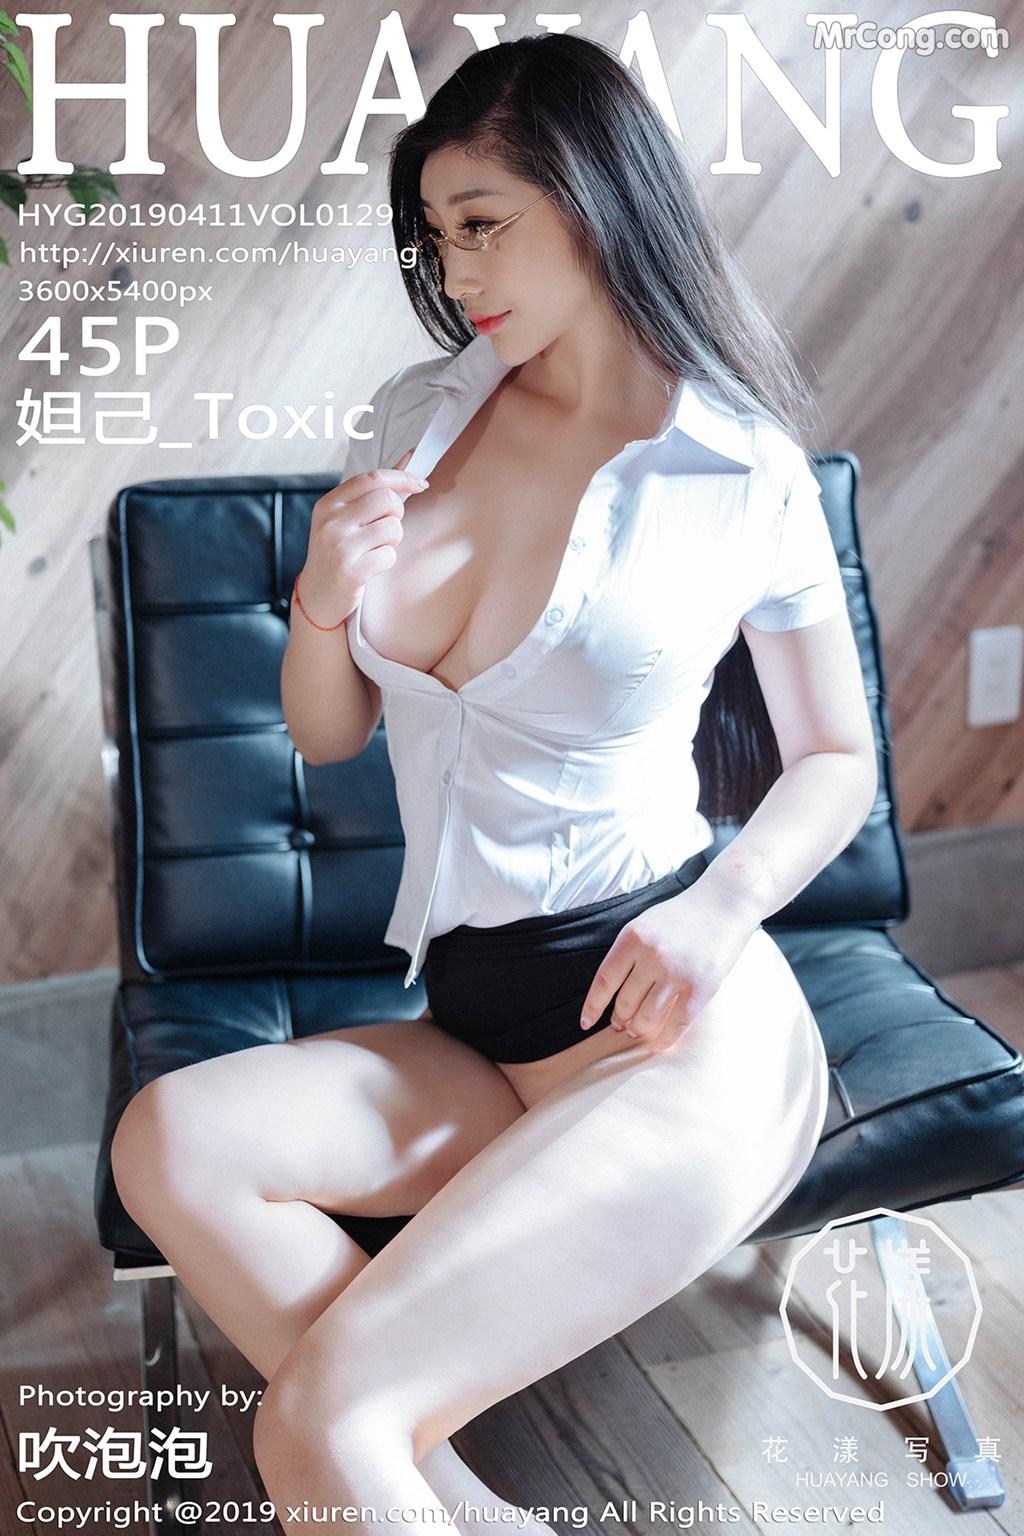 HuaYang 2019-04-11 Vol.129: Daji_Toxic (妲 己 _Toxic) (46 pictures)